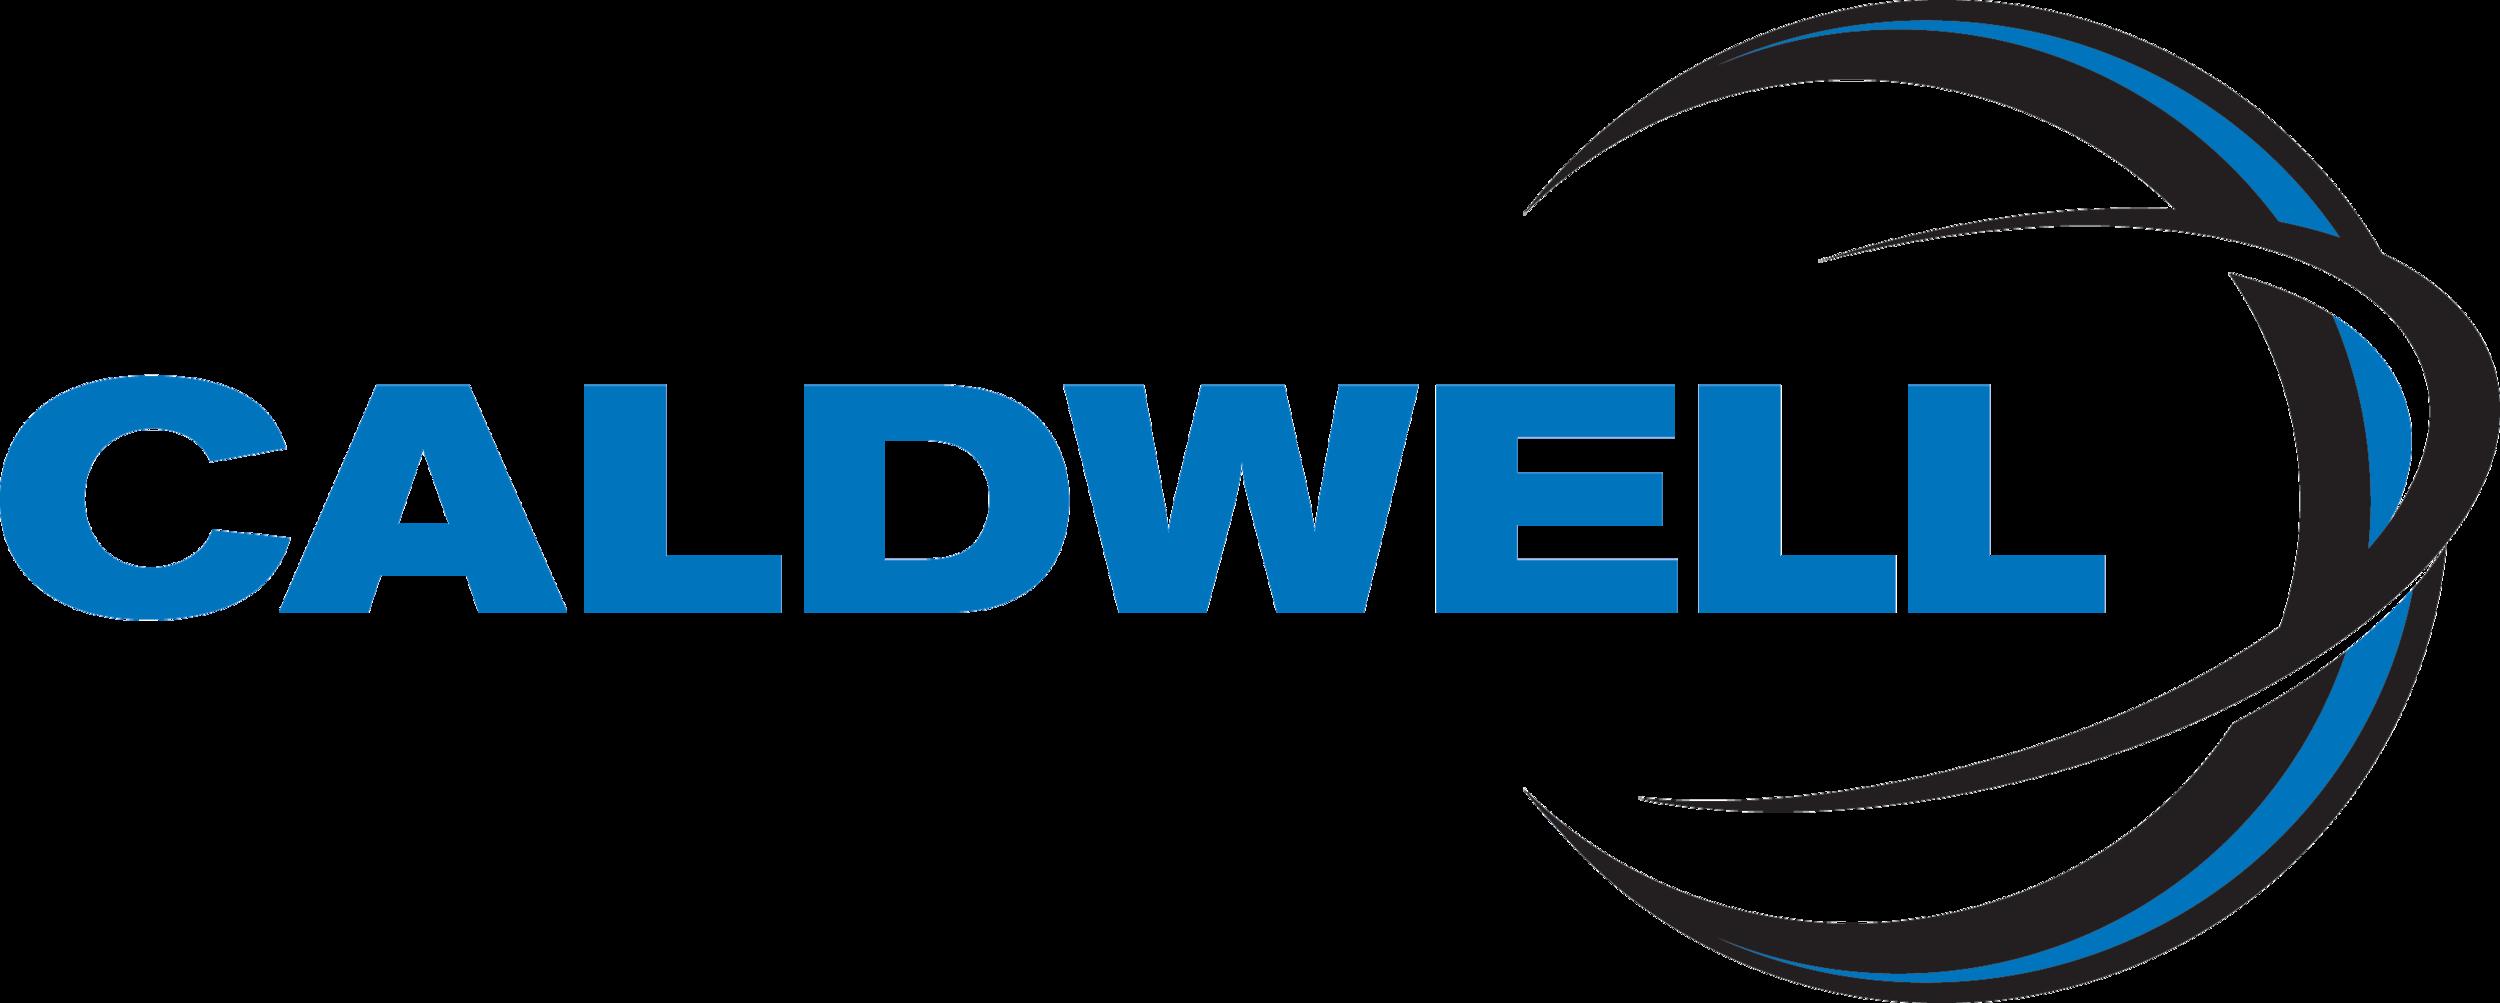 Caldwell-Logo_Final.png